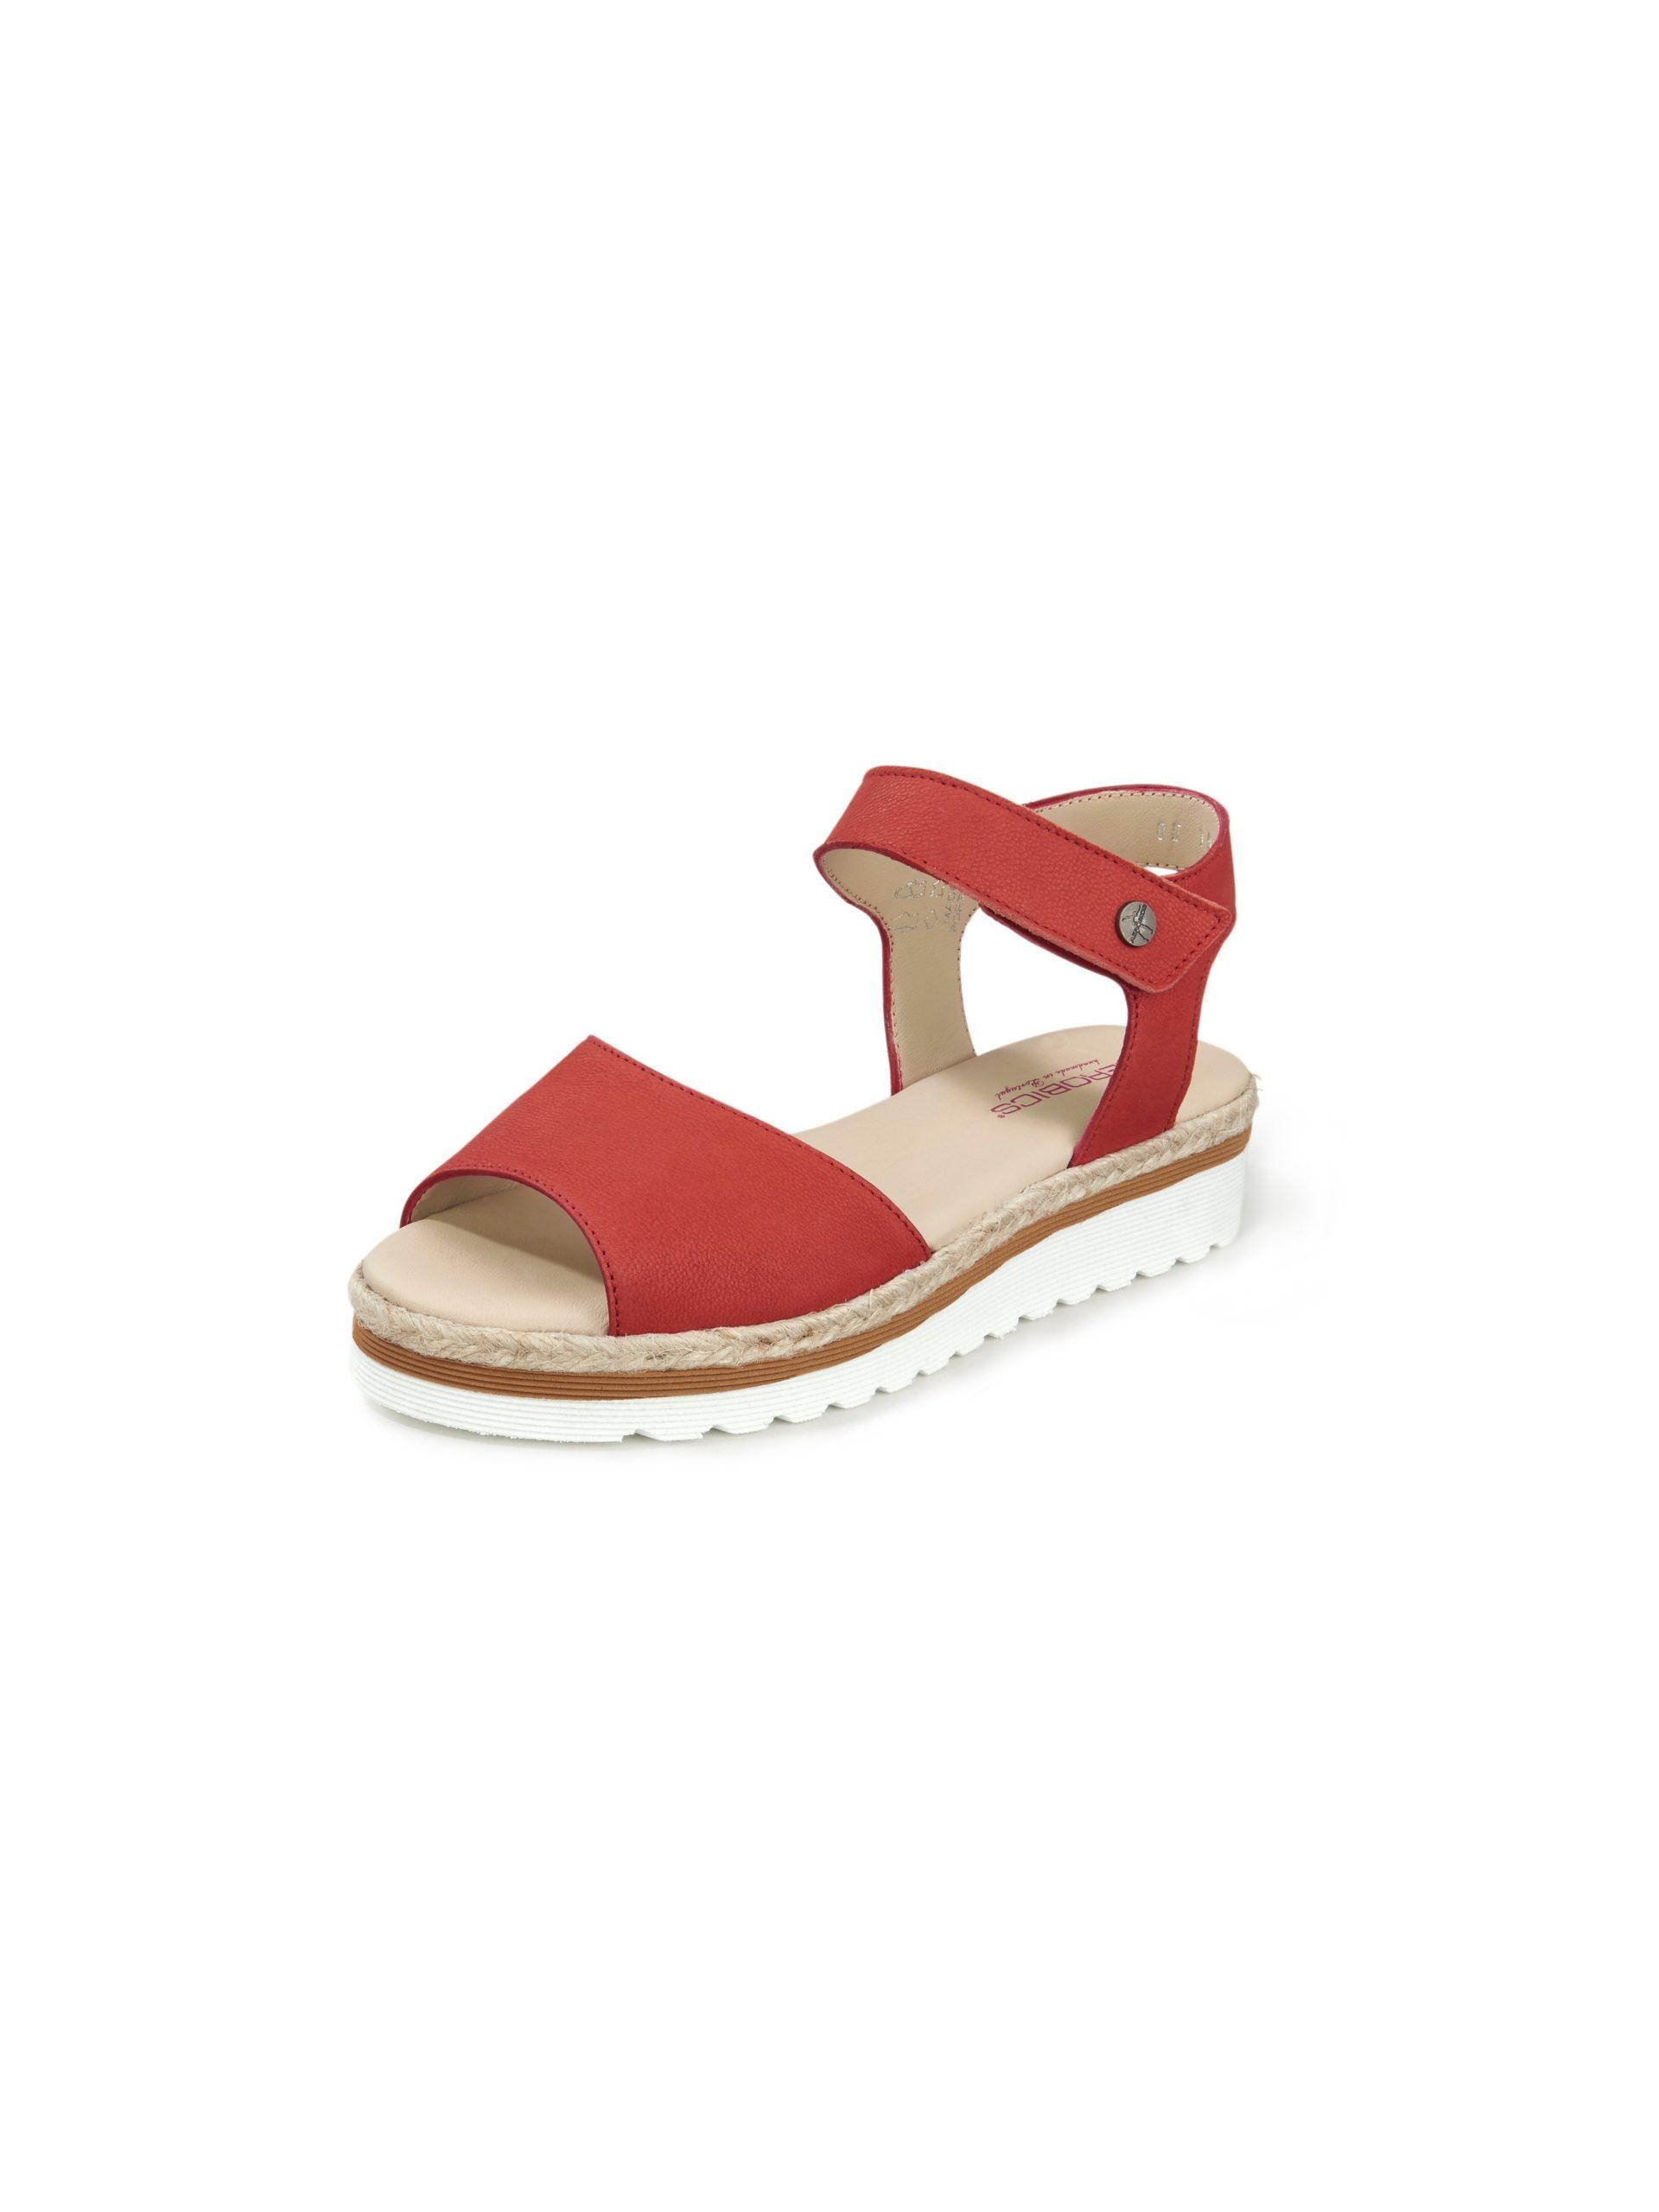 Sandaaltjes Tusk van rundnubuckleer Van Aerobics rood Kopen